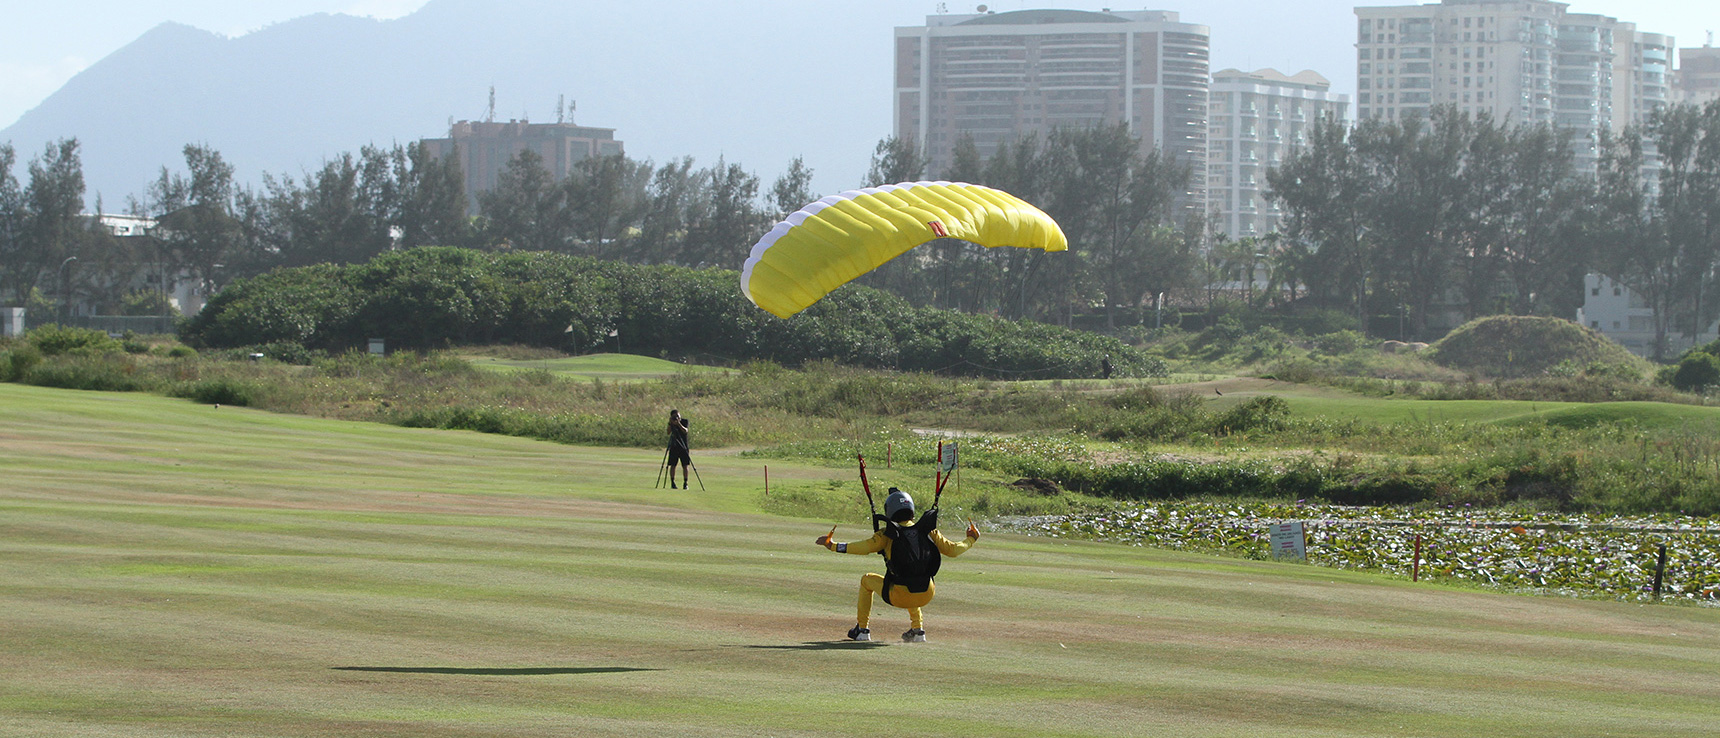 World's Smallest Canopy Landing